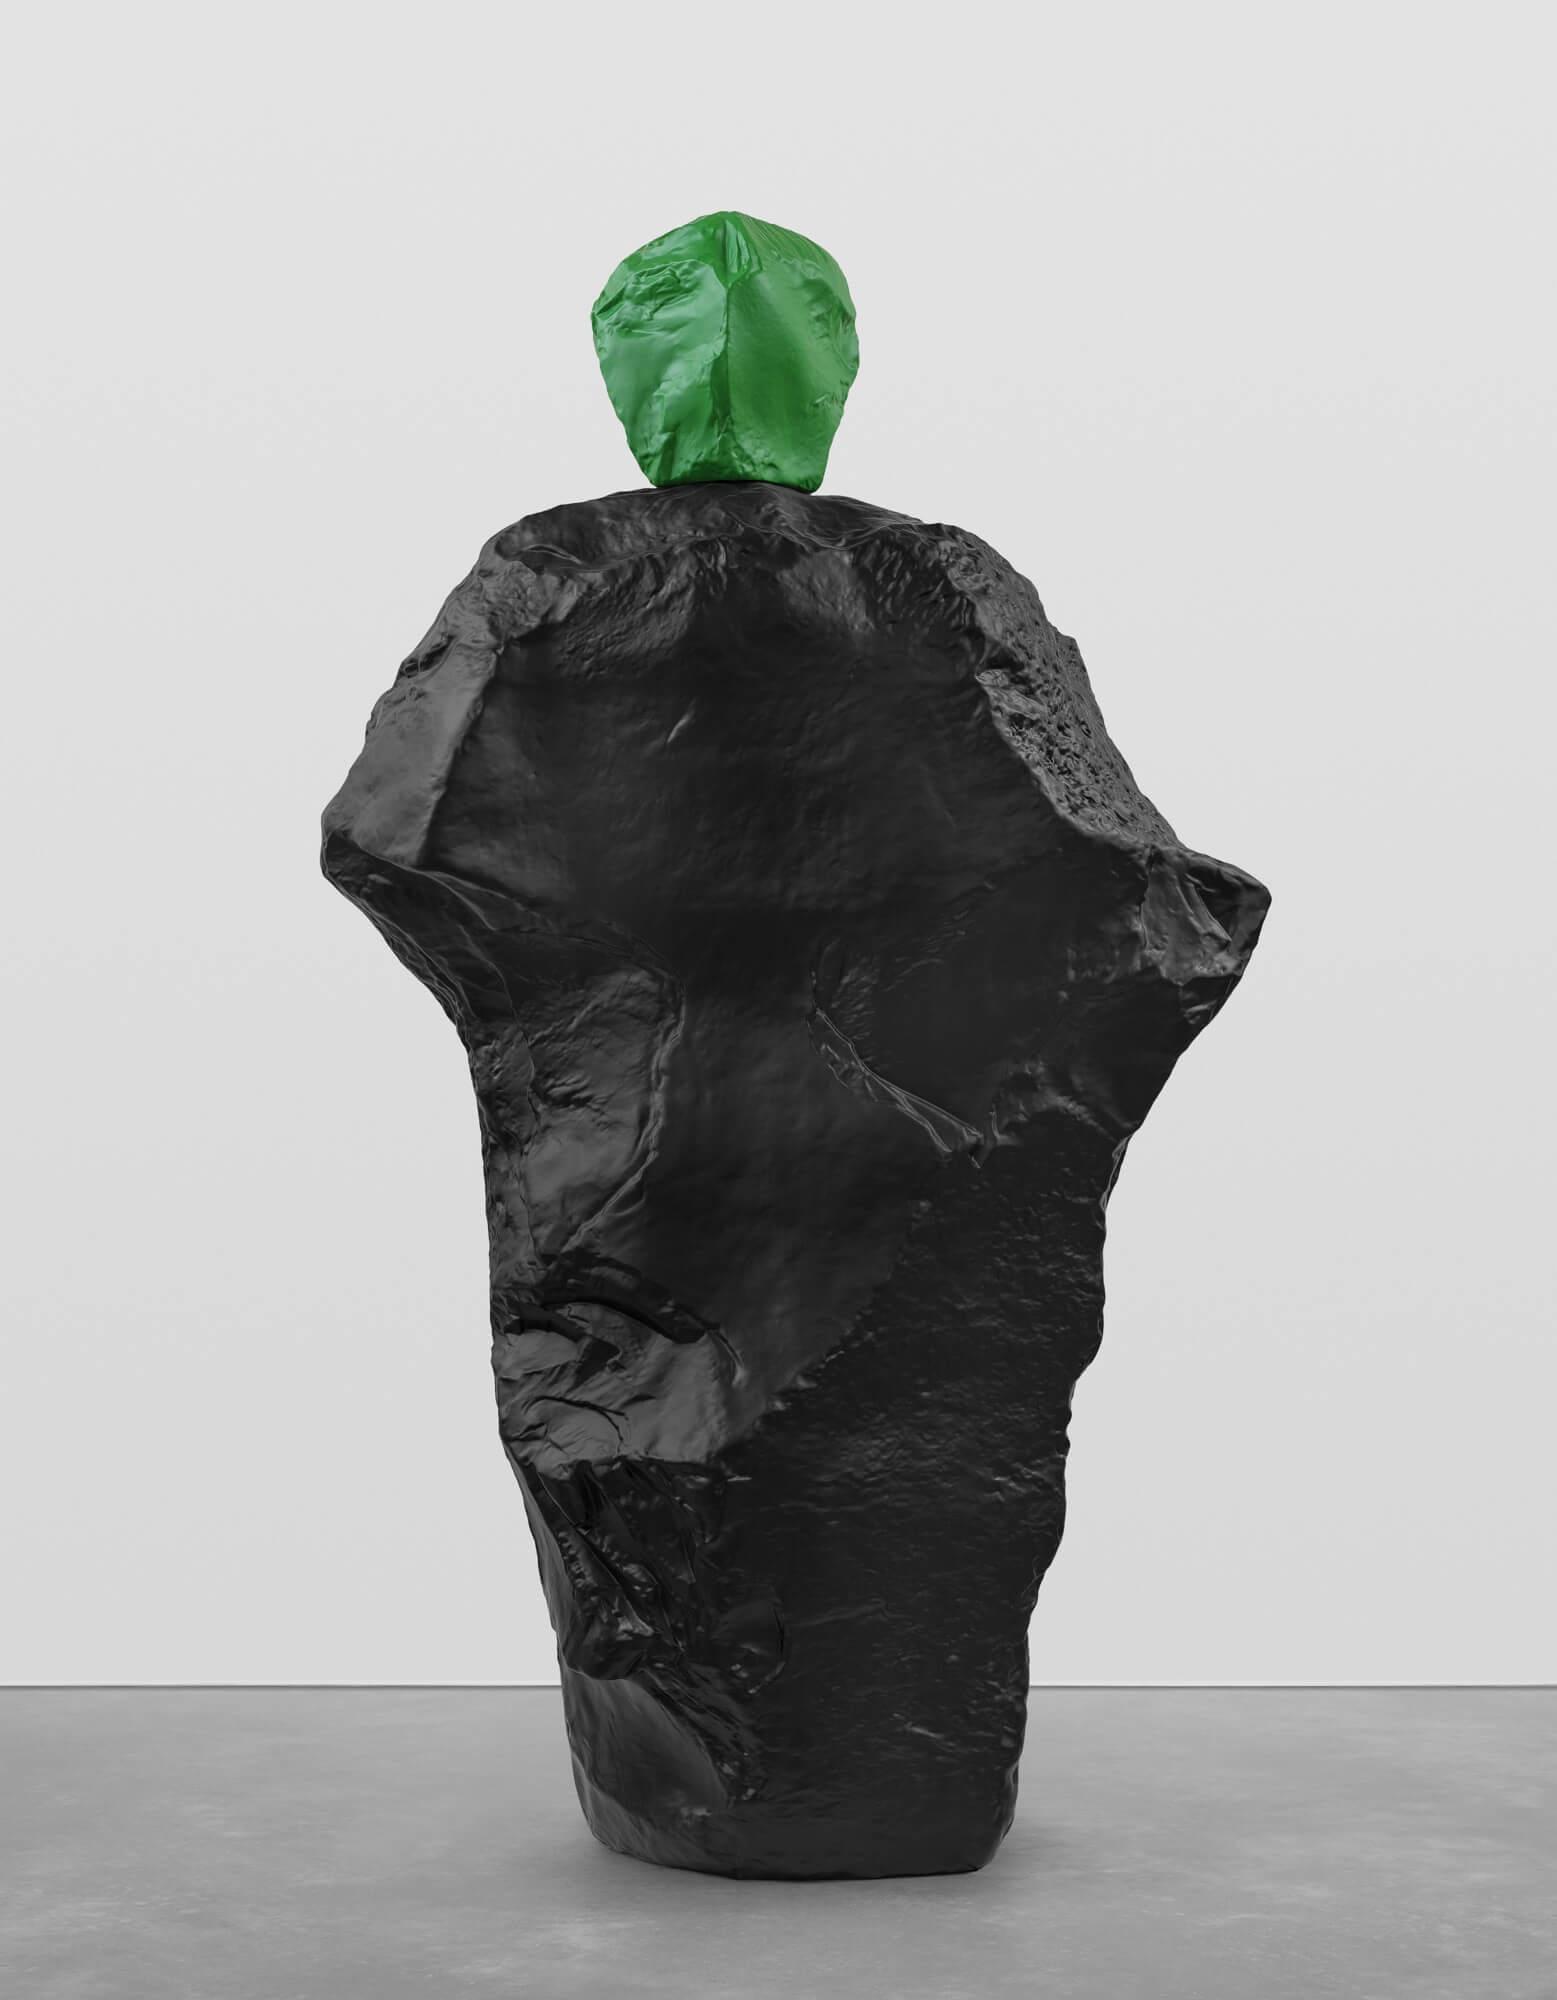 green black monk | UGO RONDINONE